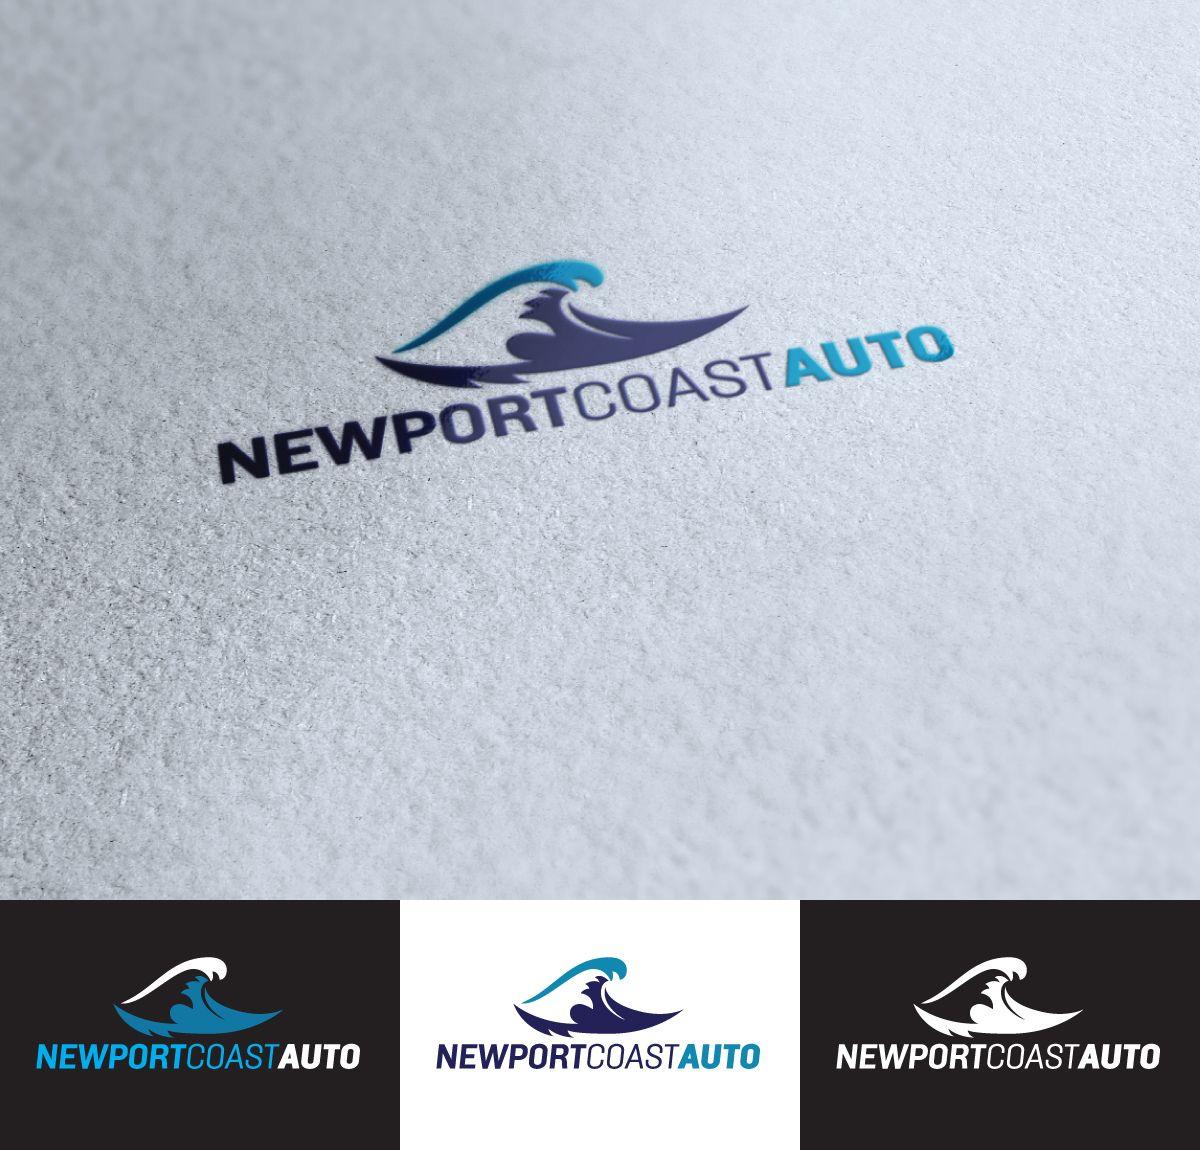 Freelance Logo Design Web Design Graphic Design Designcrowd In 2020 Logo Design Freelance Logo Web Design